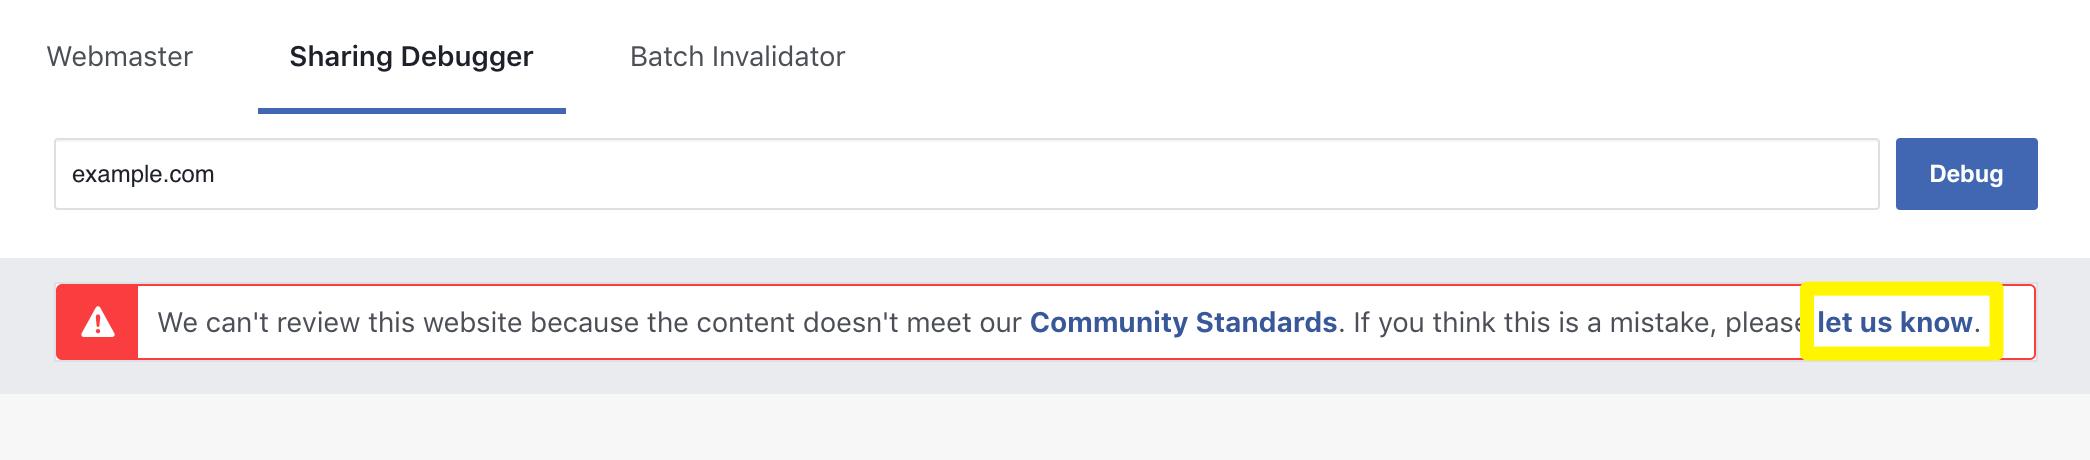 how-to-unblock-a-blocked-URL-on-facebook-4如何取消对Facebook上的被阻止URL